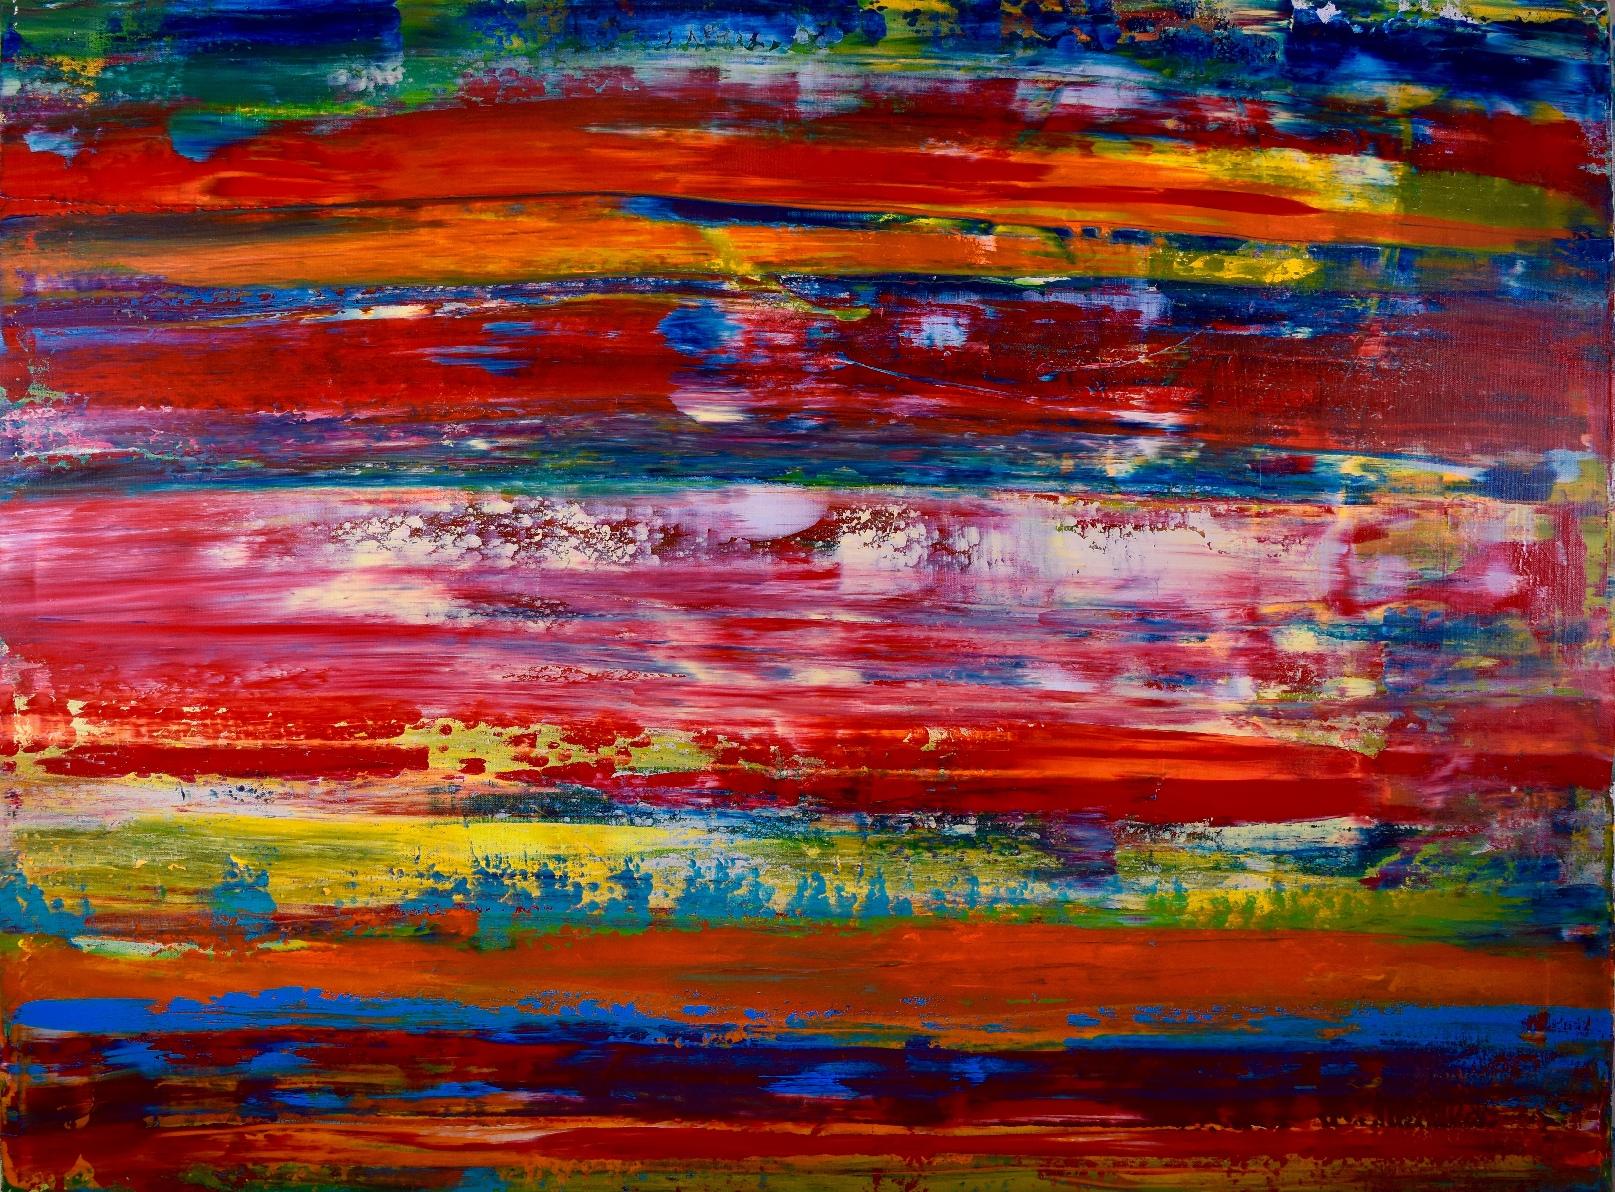 Volcanic Terrain(Fiery layers) - SOLD - artist Nestor Toro